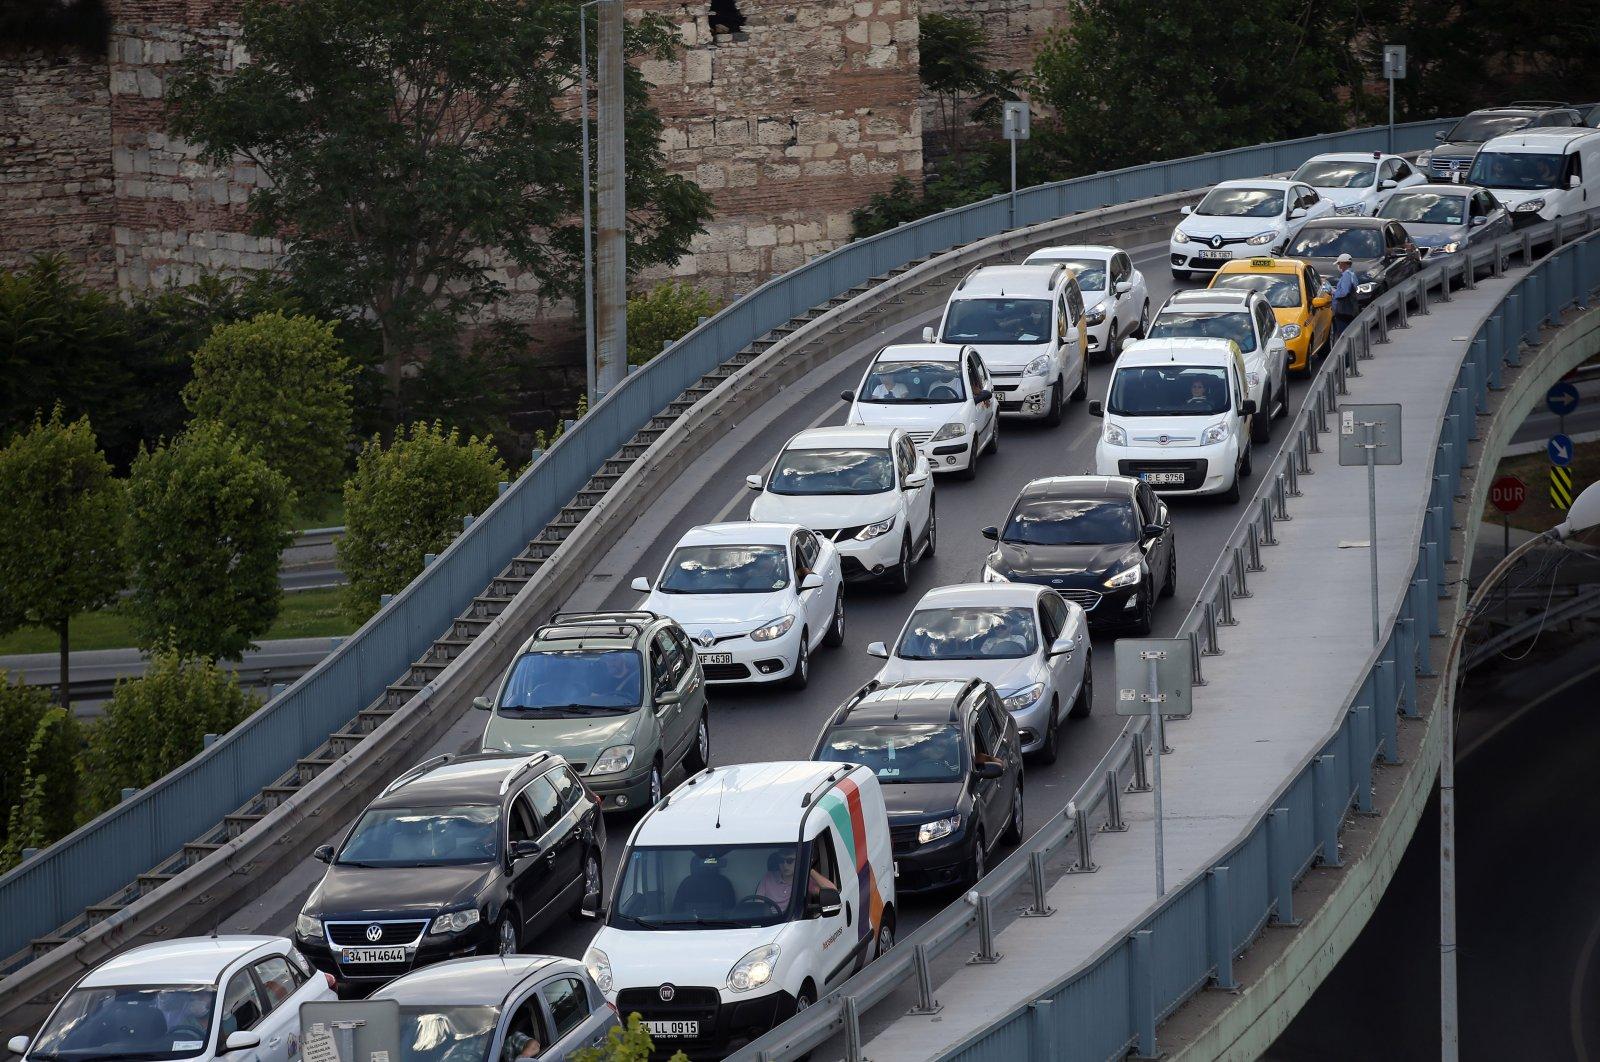 Cars drive on the D-100 state highway in the Edirnekapı neighborhood of Istanbul, July 21, 2020. (AA Photo)